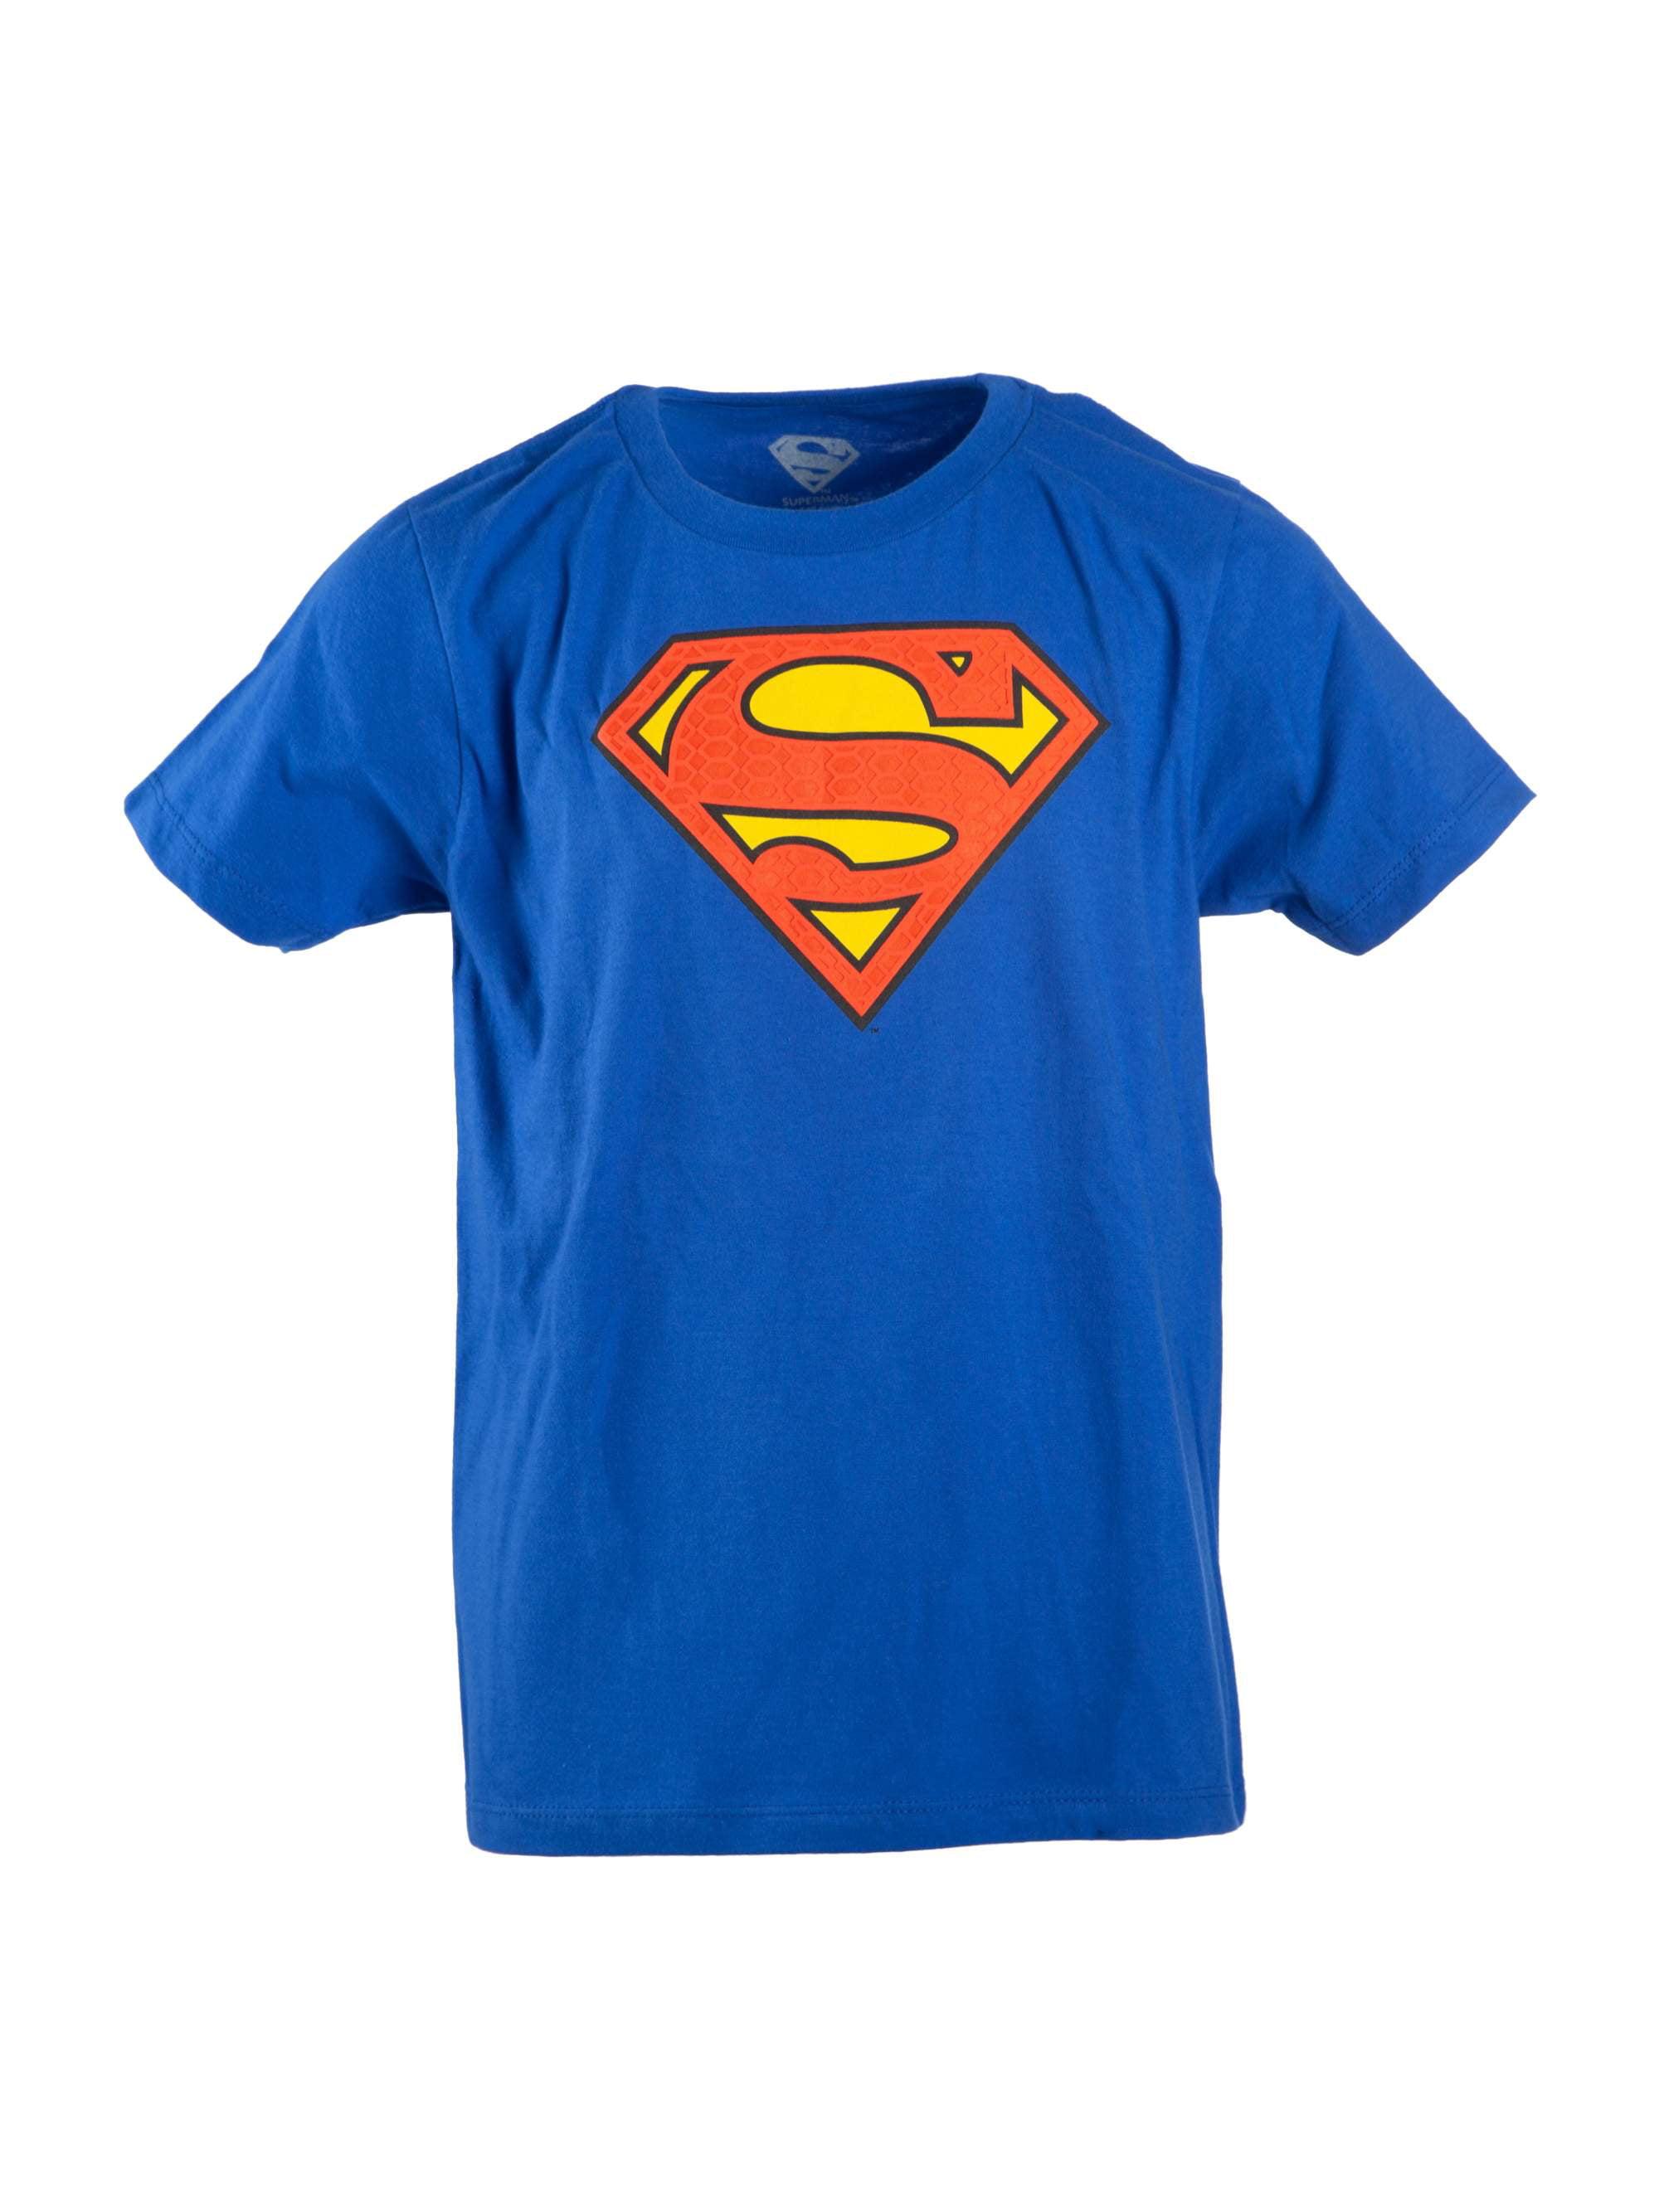 Boy's Royal Blue DC Comics Superman Logo with HD Ink Short Sleeve Tee